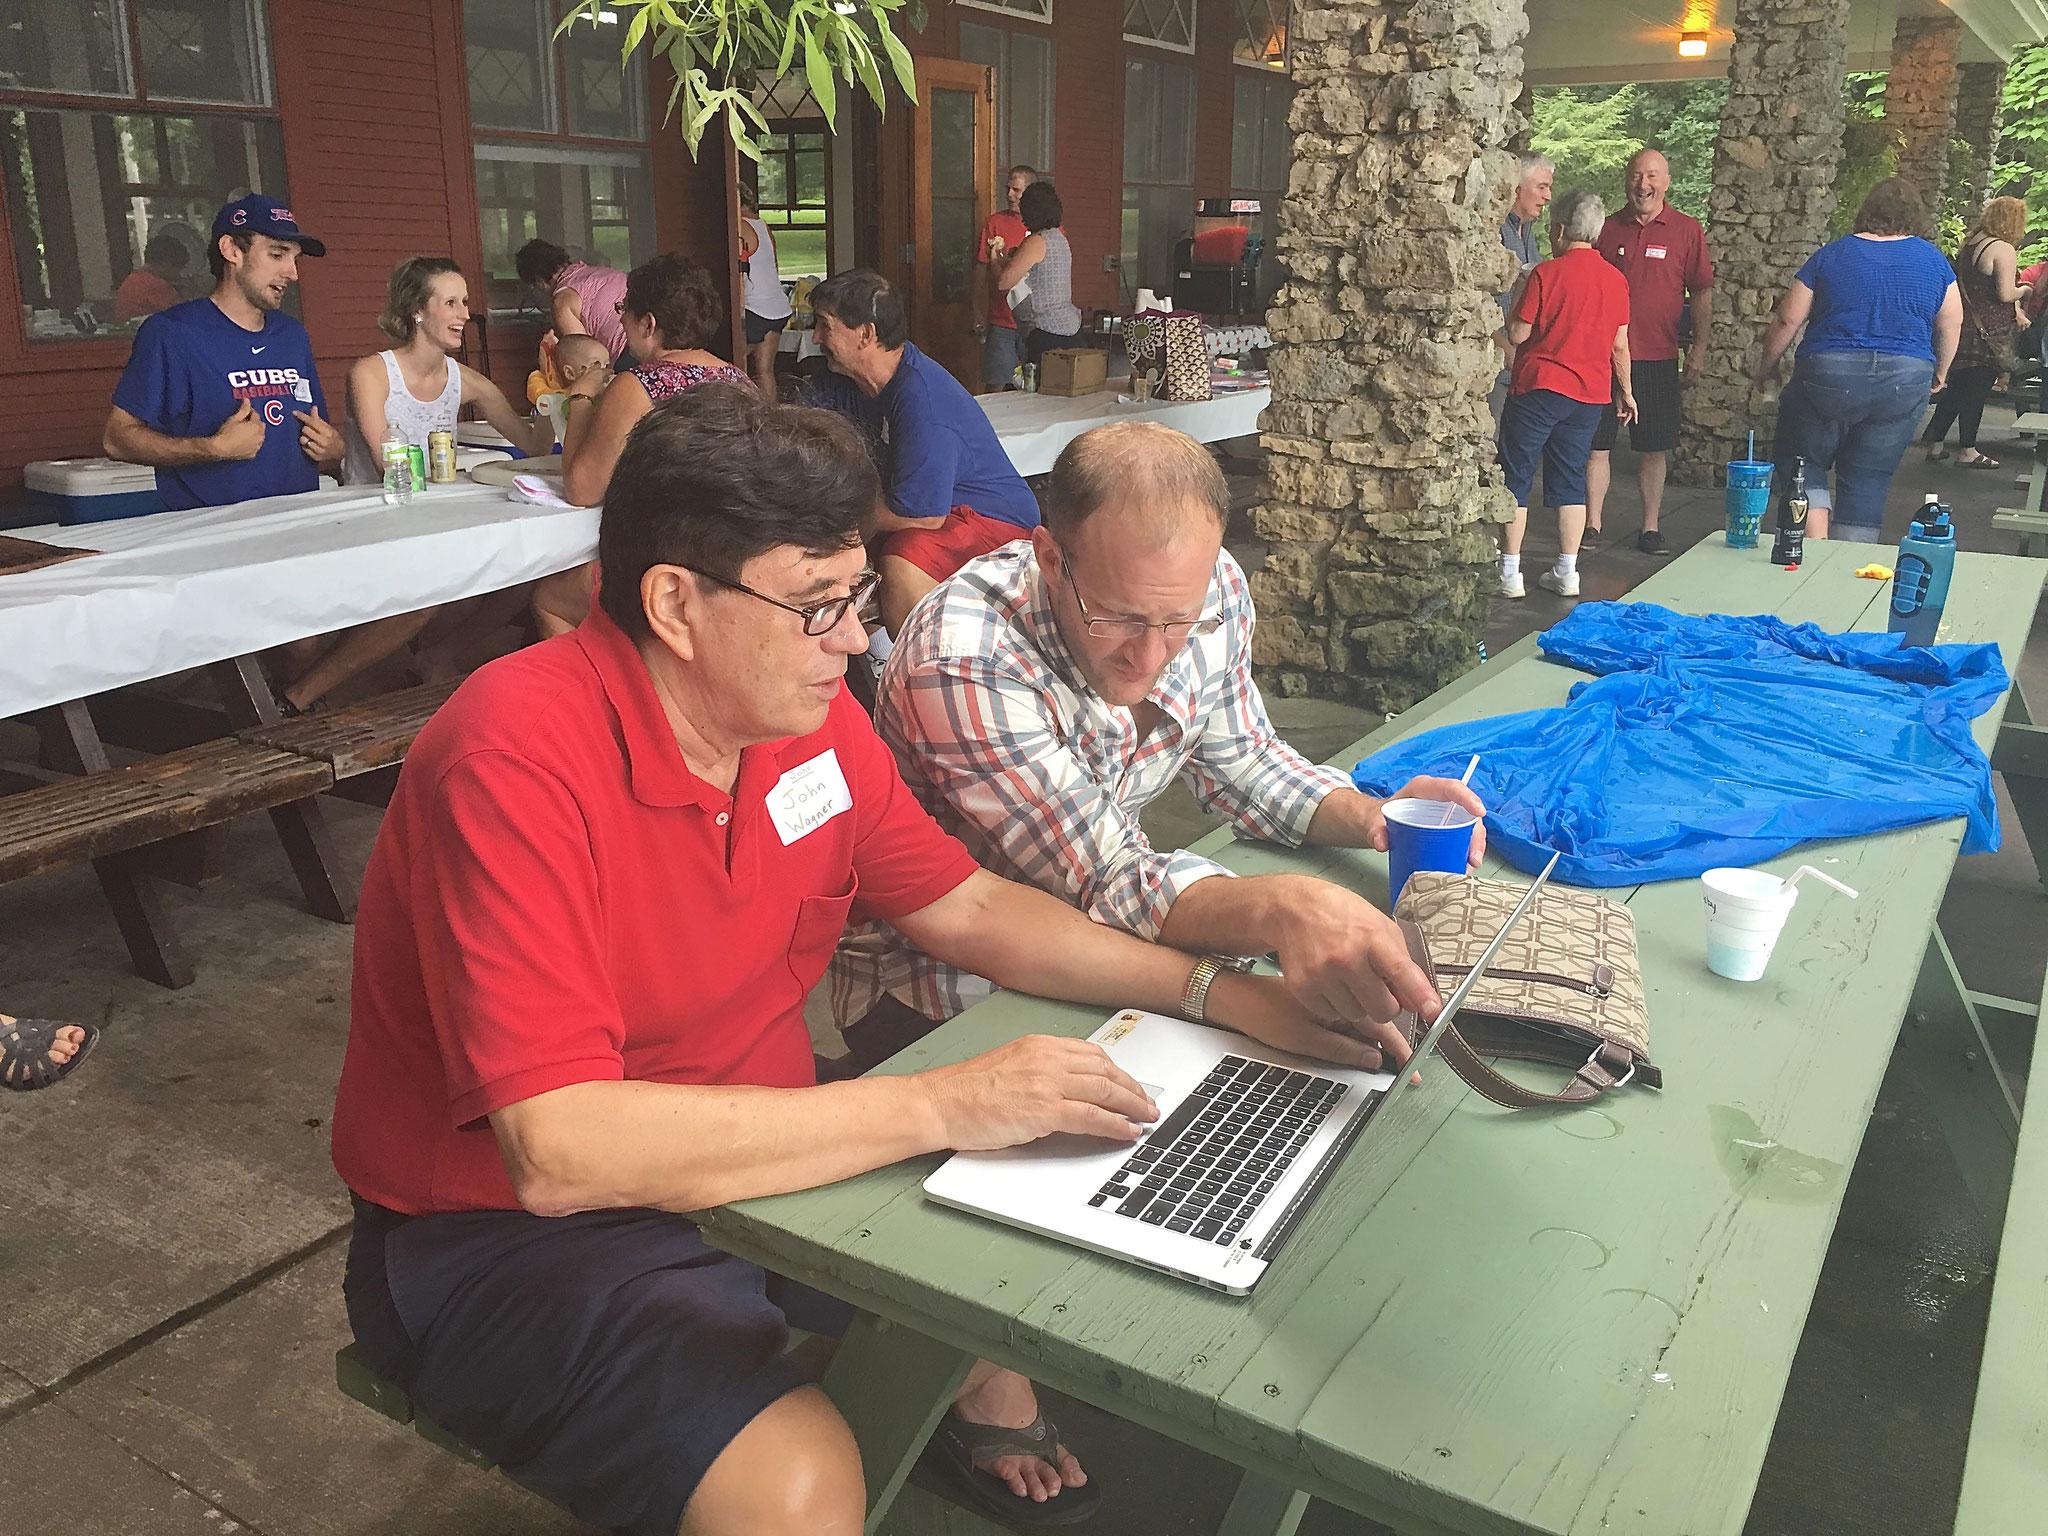 John Wagner entering some more genealogy data with Tim Wagner